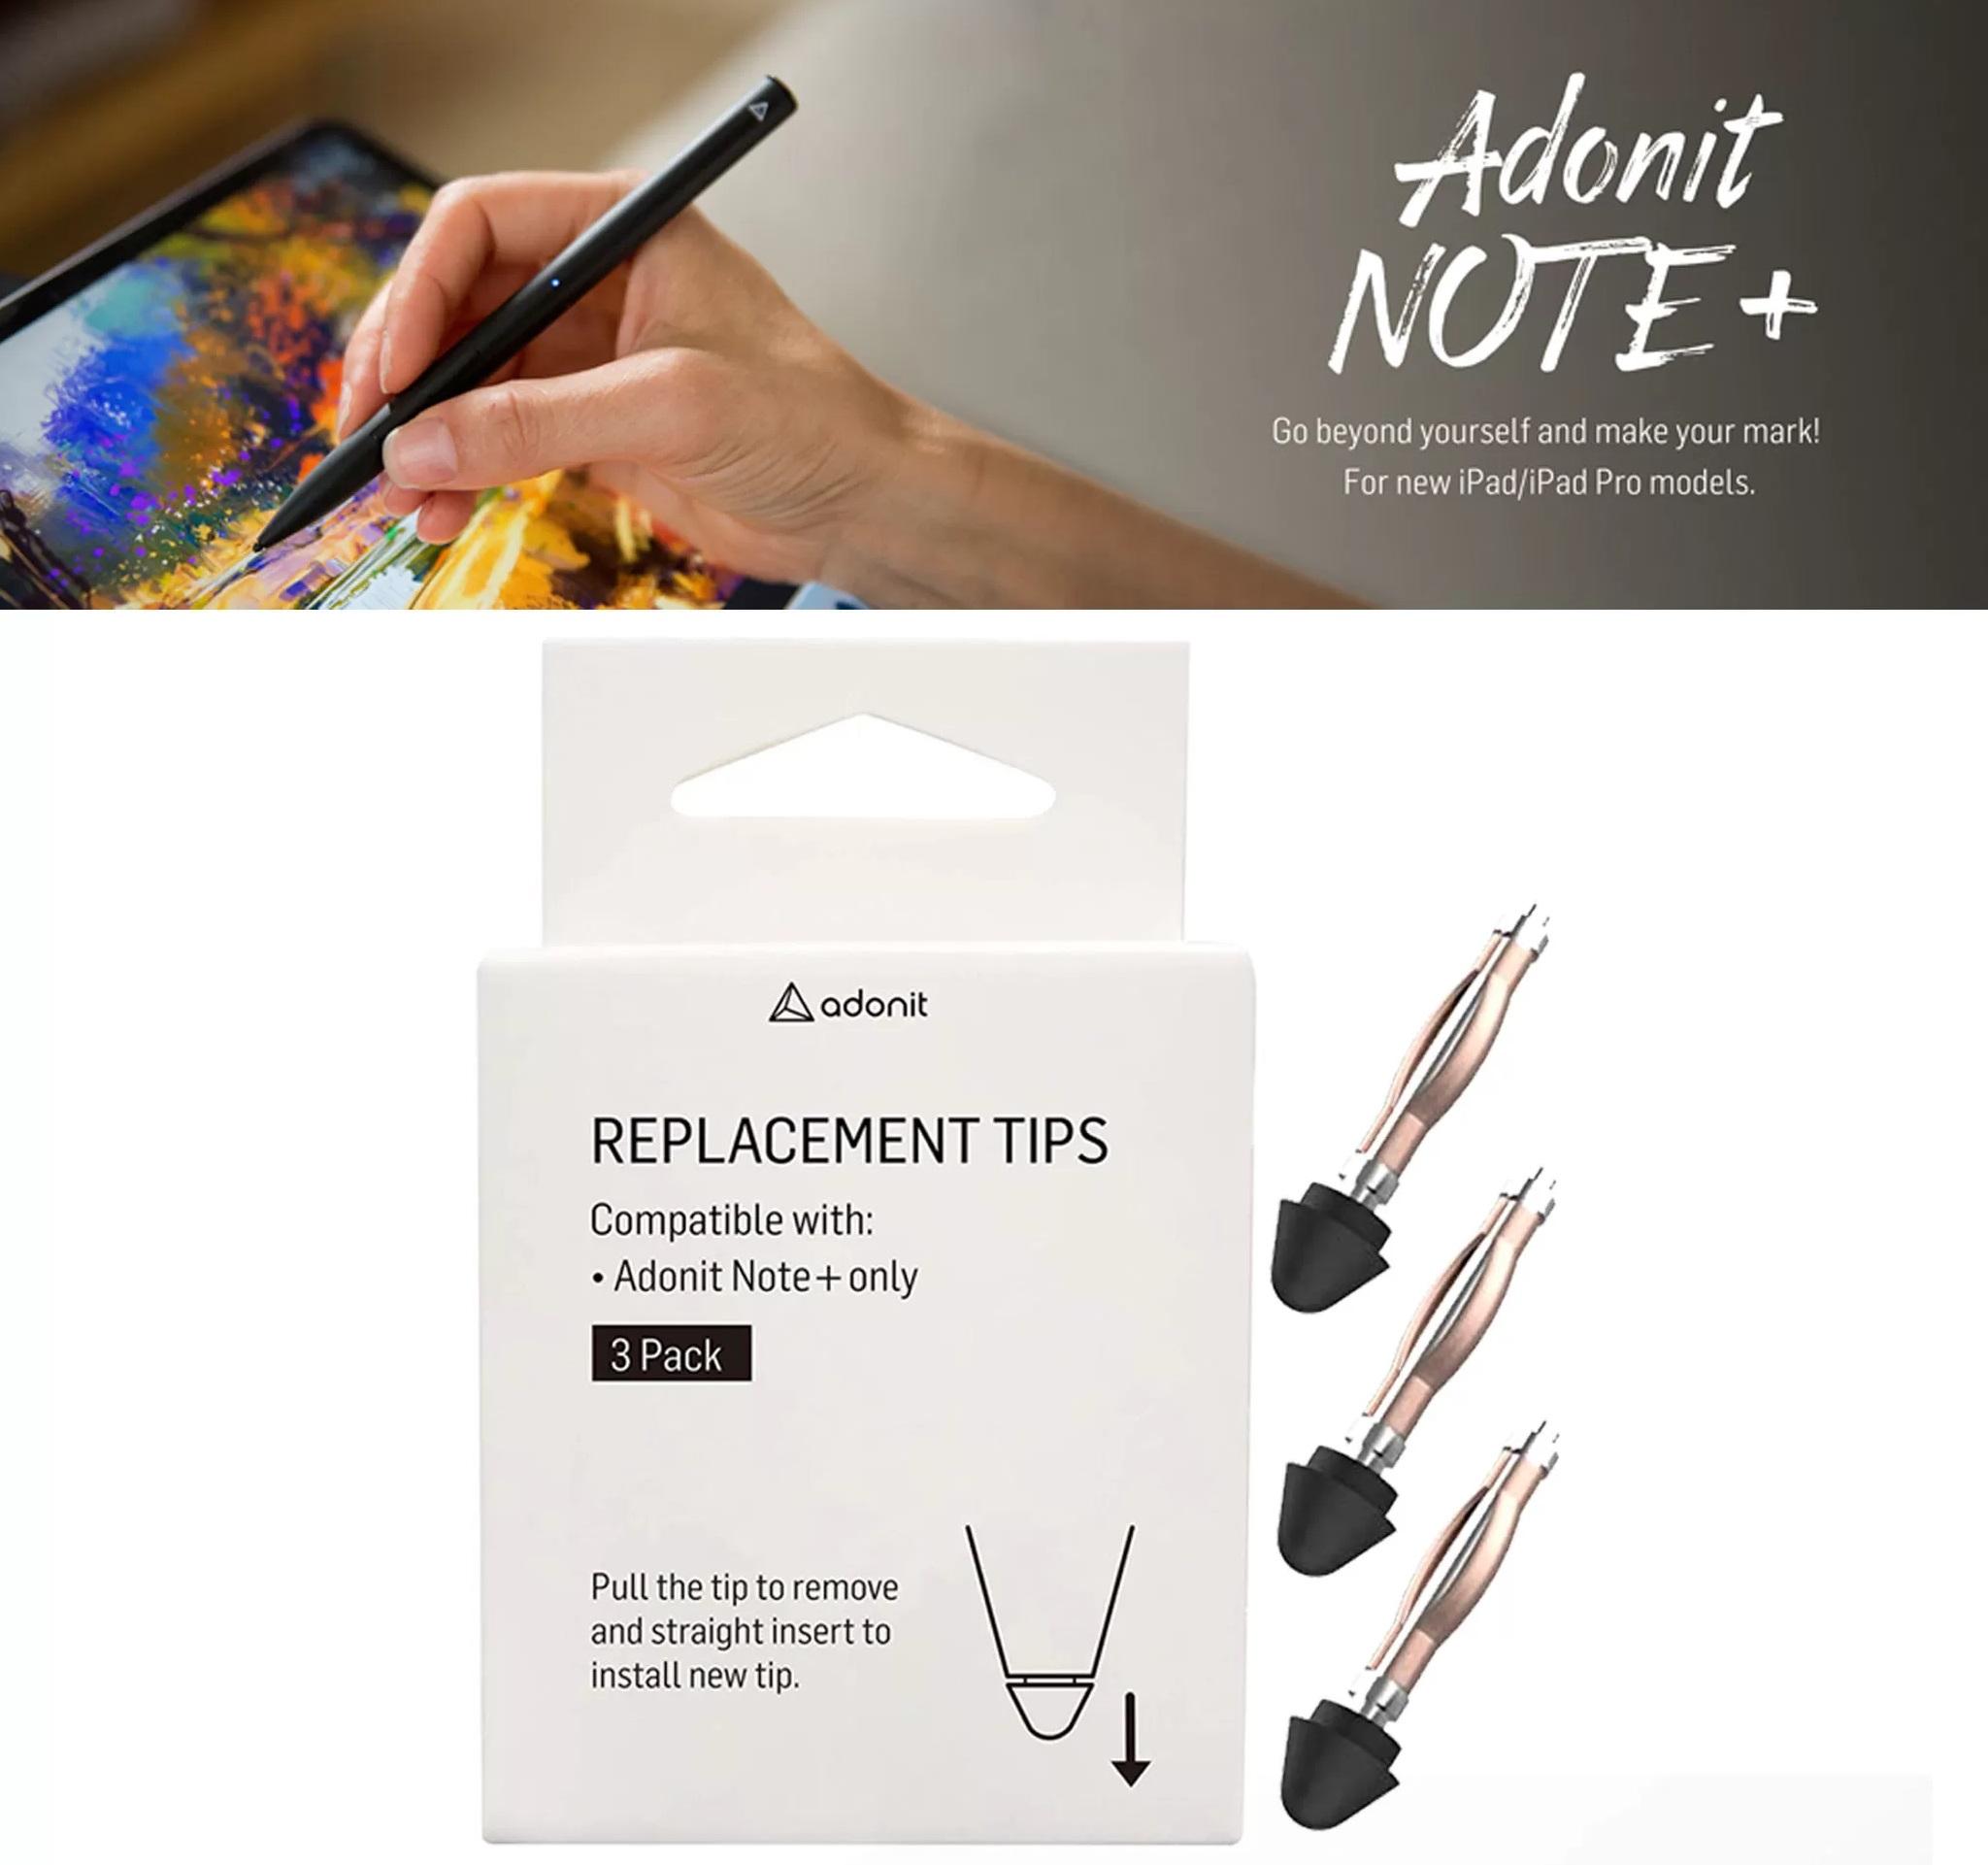 Adonit Note+ Plus / Adonit Note Replacement Tips (ARNST) (3pcs)